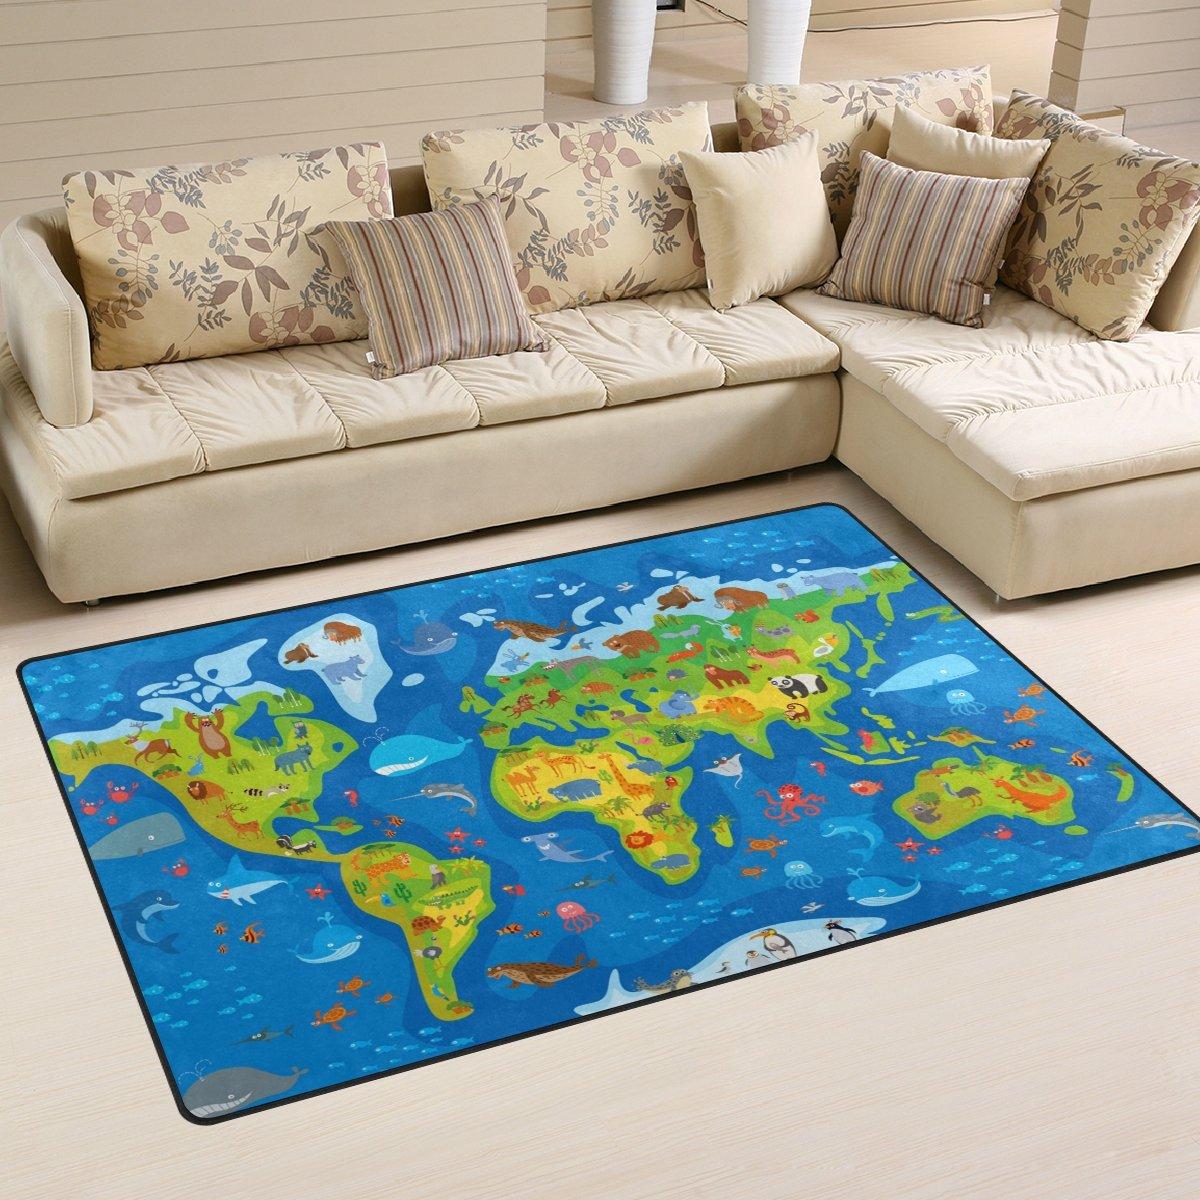 DEYYA Kid World Map Memory Foam Area Rug,Modern Floor Rug Carpet for Living Room Bedroom Home Decor, Play Mats for Infants 31 x 20 inches g1802993p146c161s240